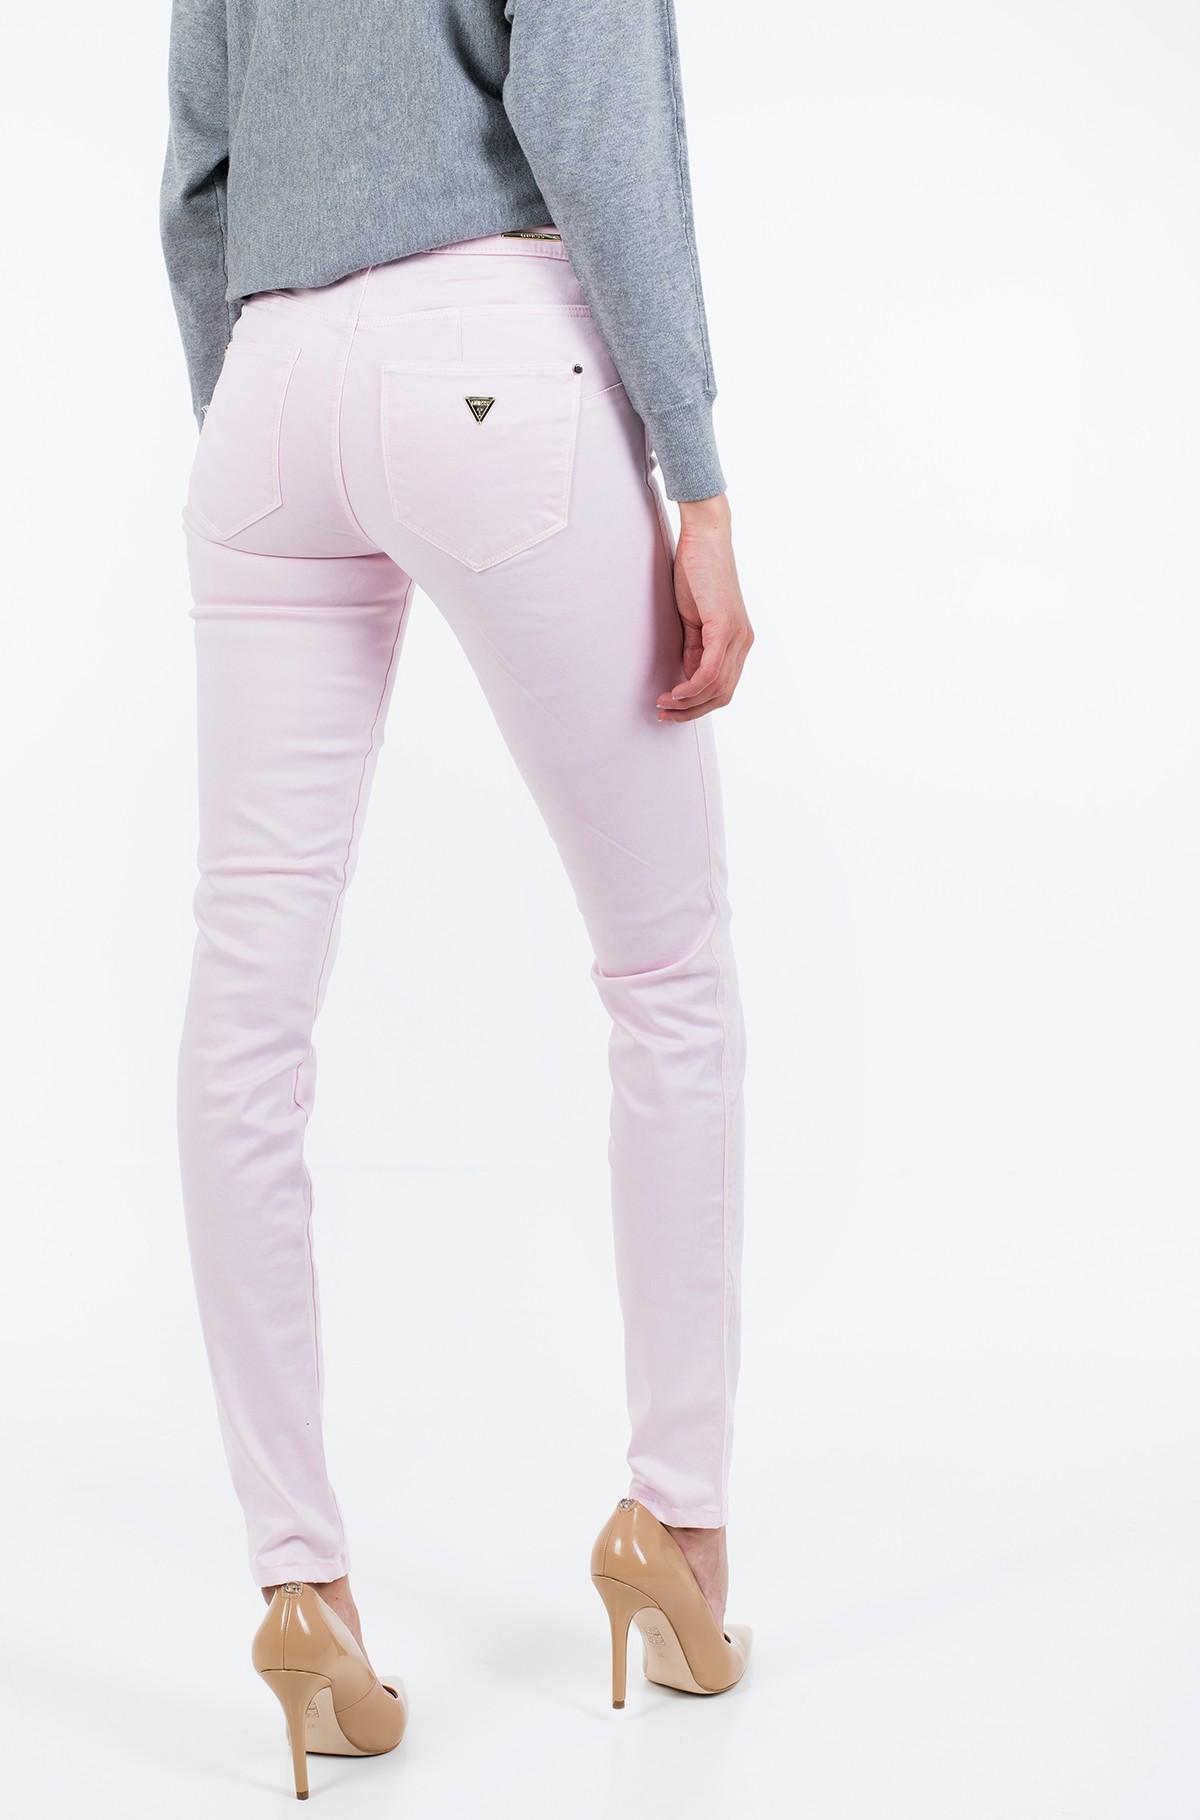 Jeans W02AJ2 W93C6-full-2